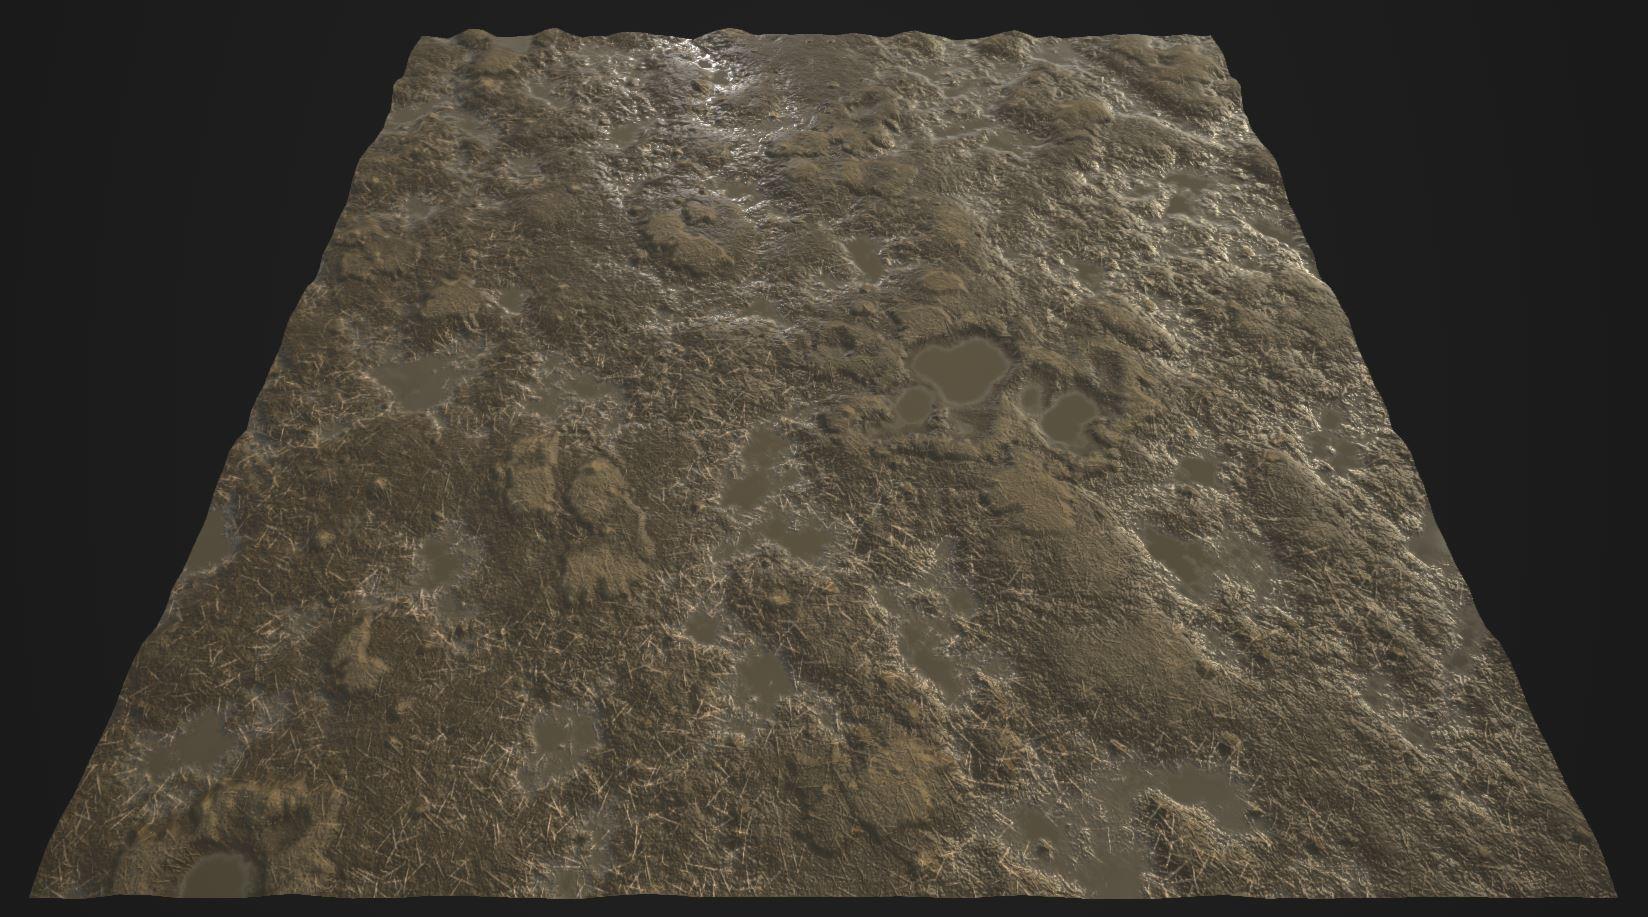 Osman samano mud cover